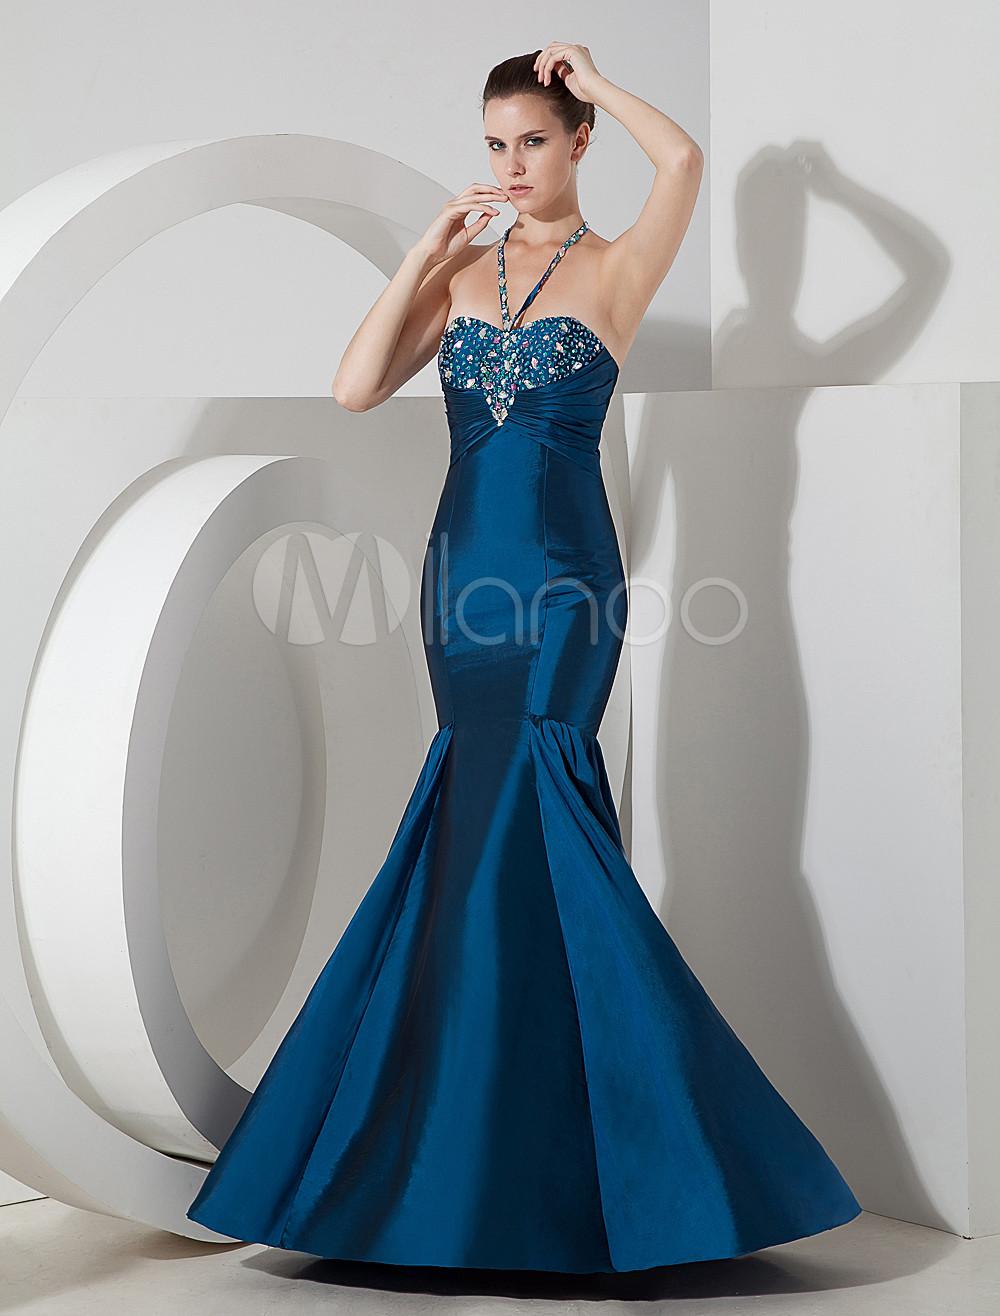 Amazing Mermaid Blue Satin Floor Length Prom Dress